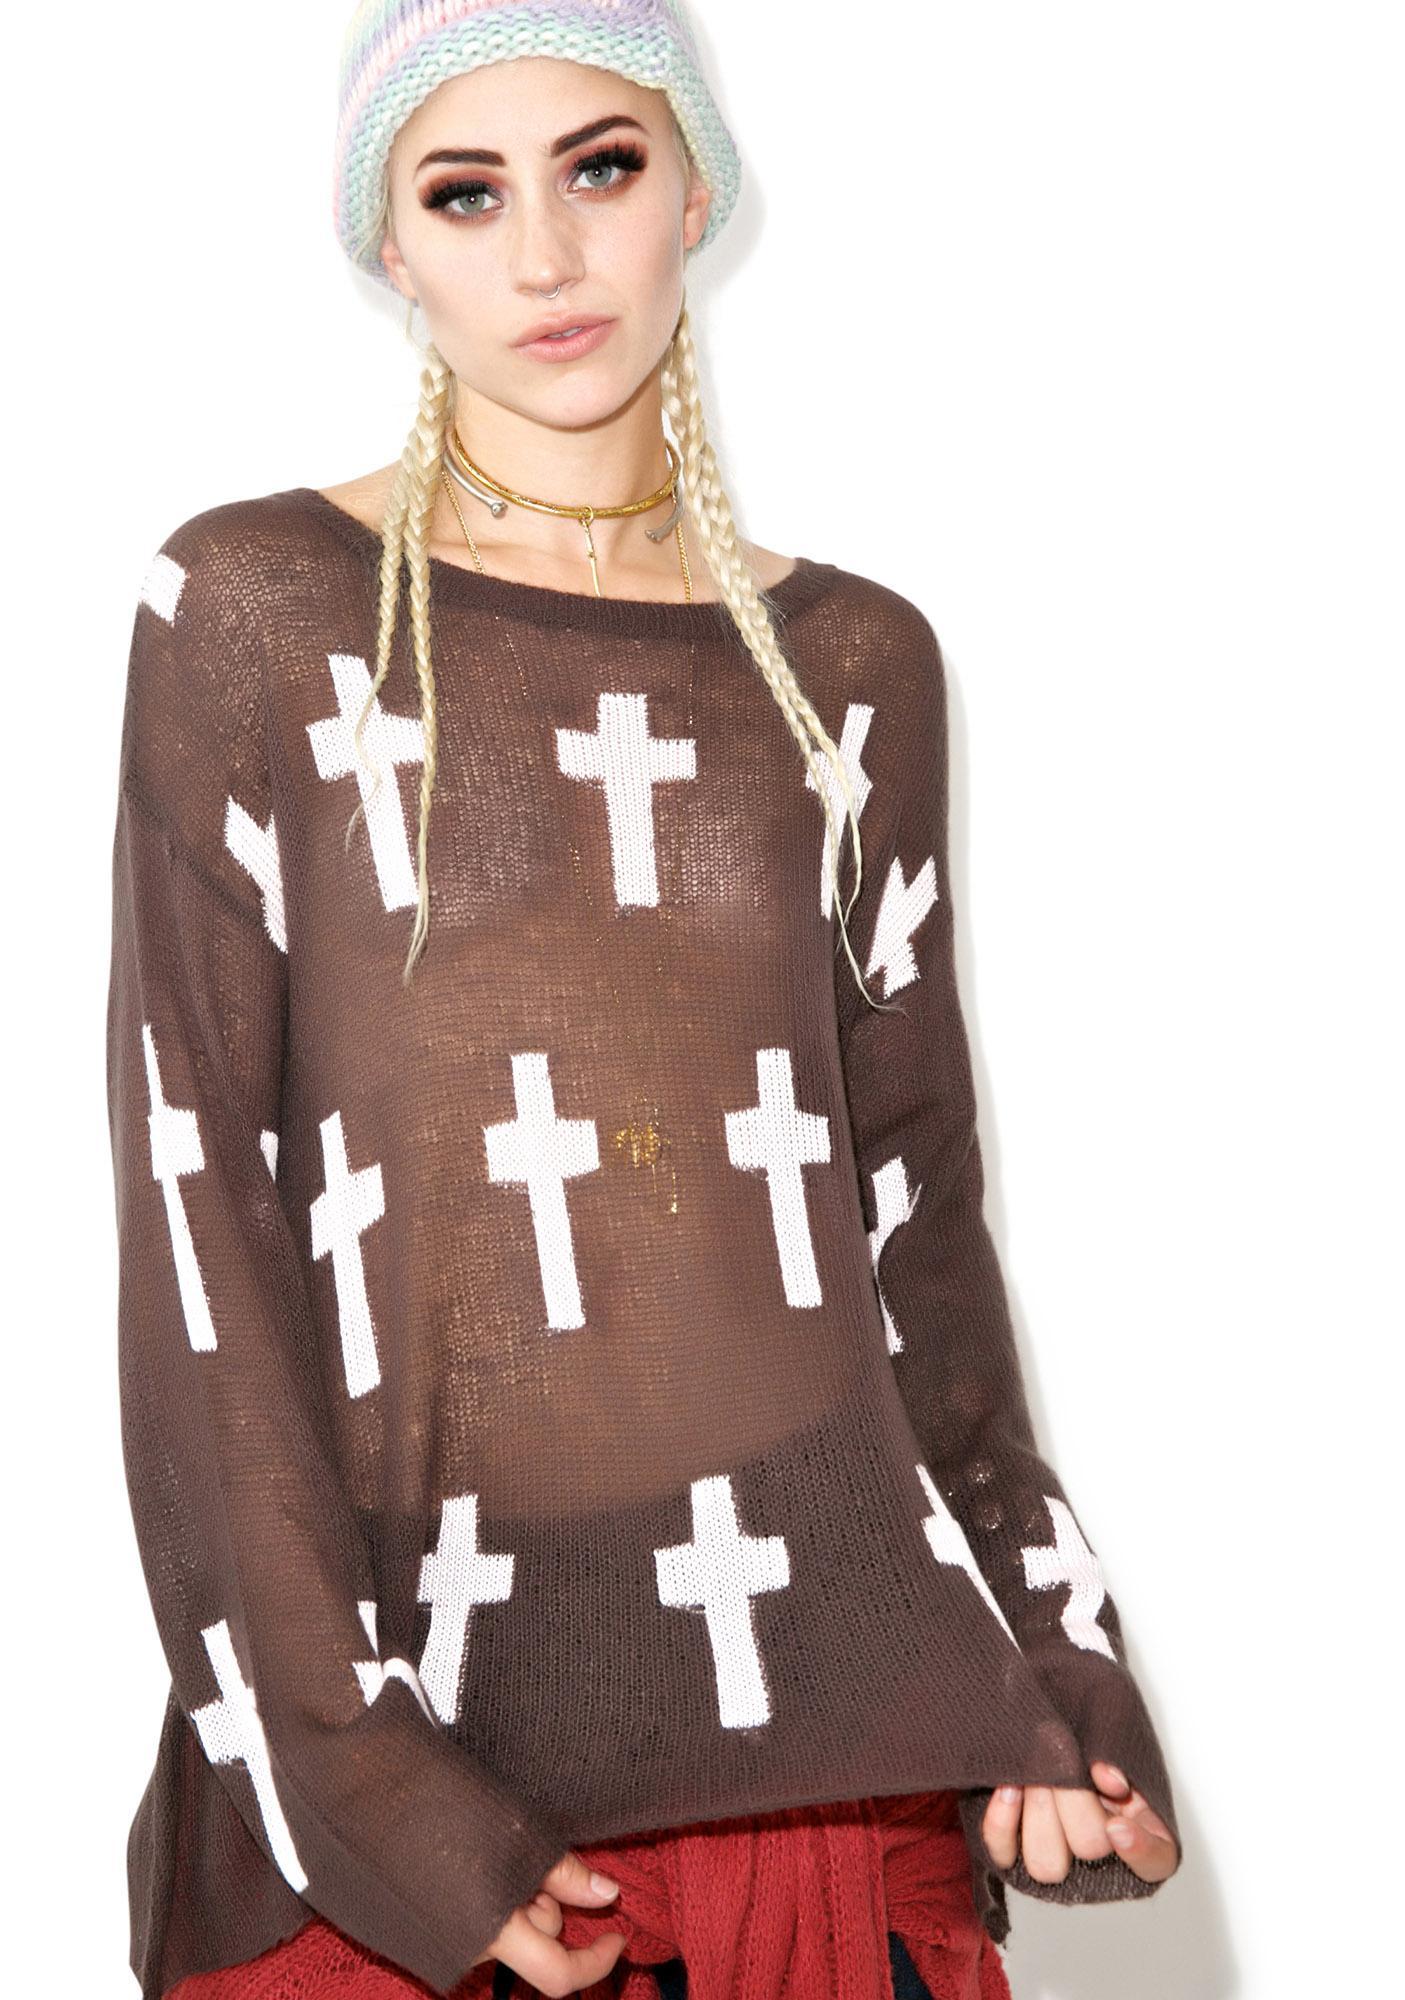 Wildfox Couture Judgement Roadie Sweater